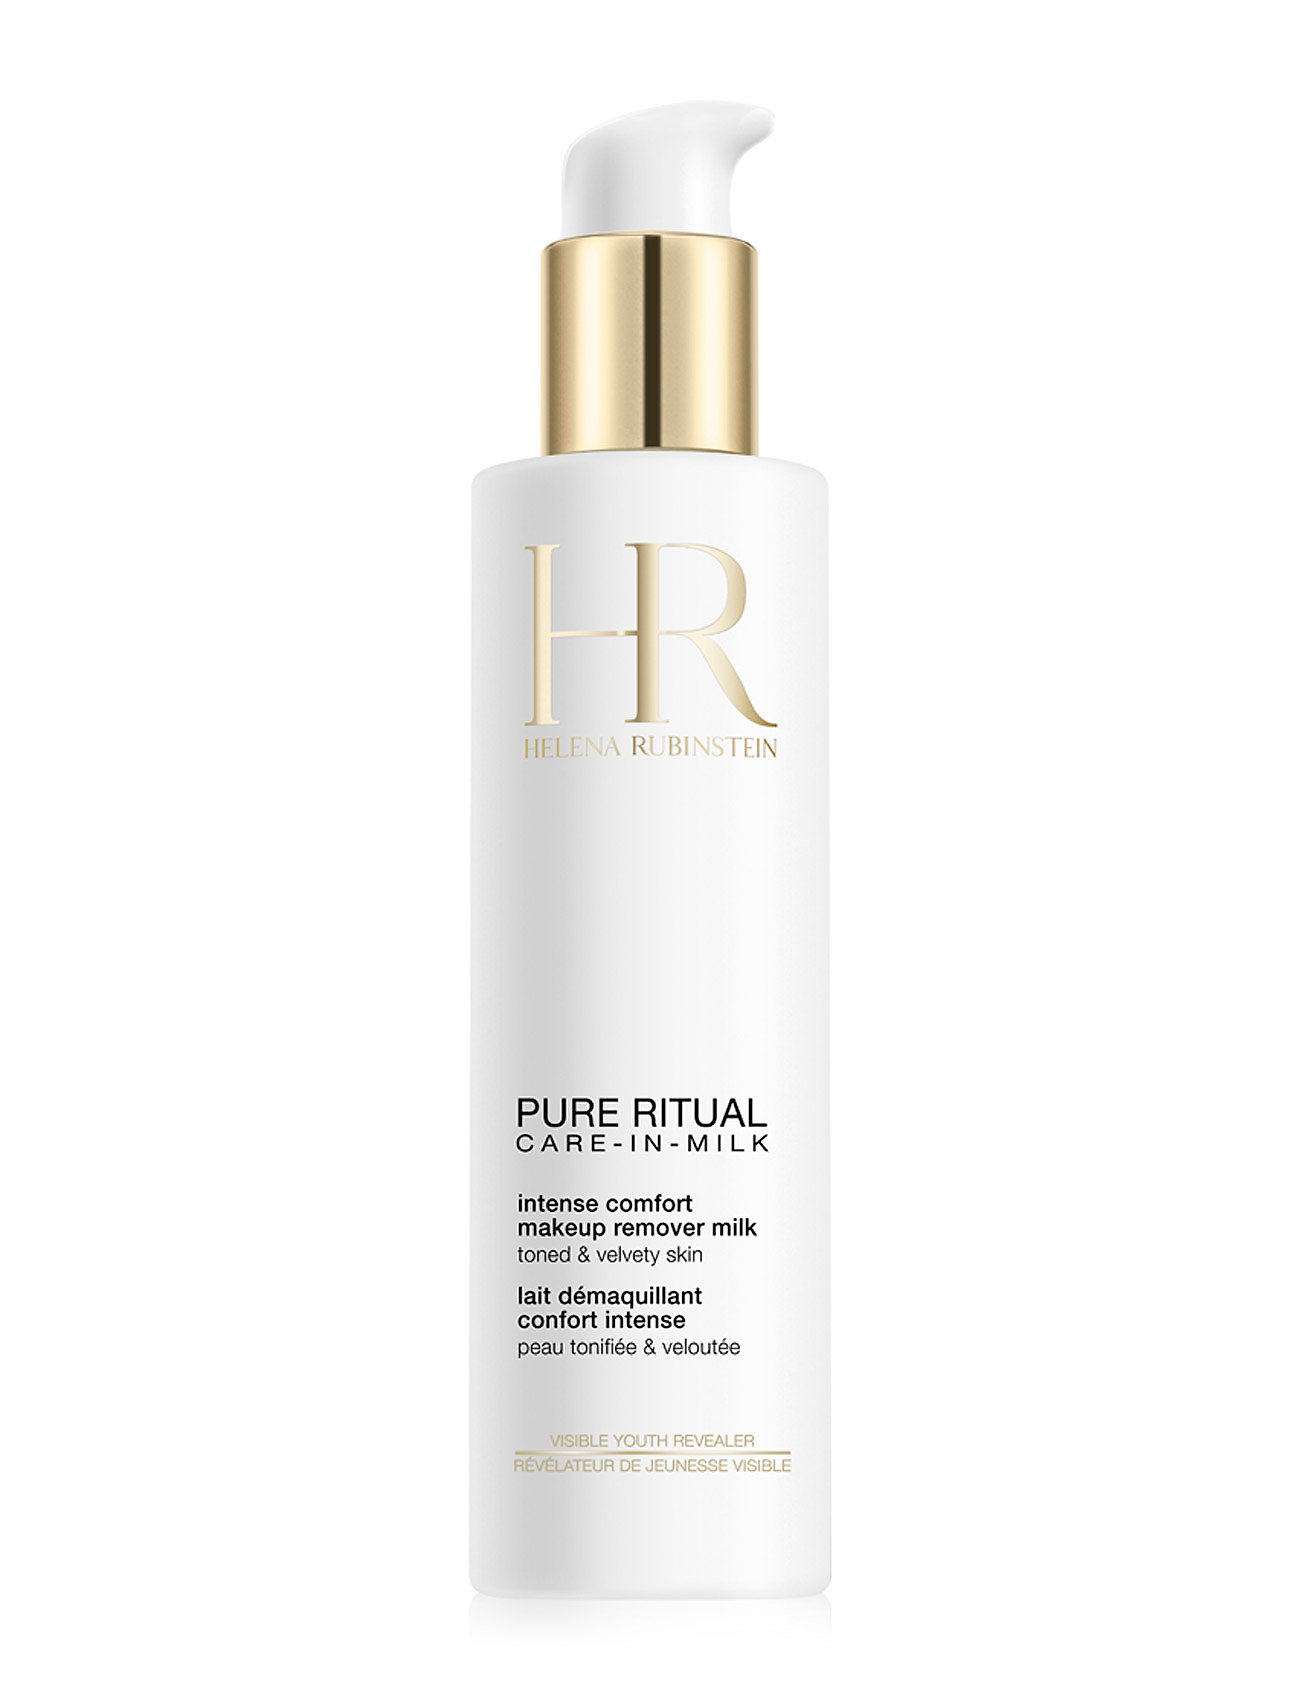 Pure ritual care-in-milk  200 ml fra helena rubinstein fra boozt.com dk